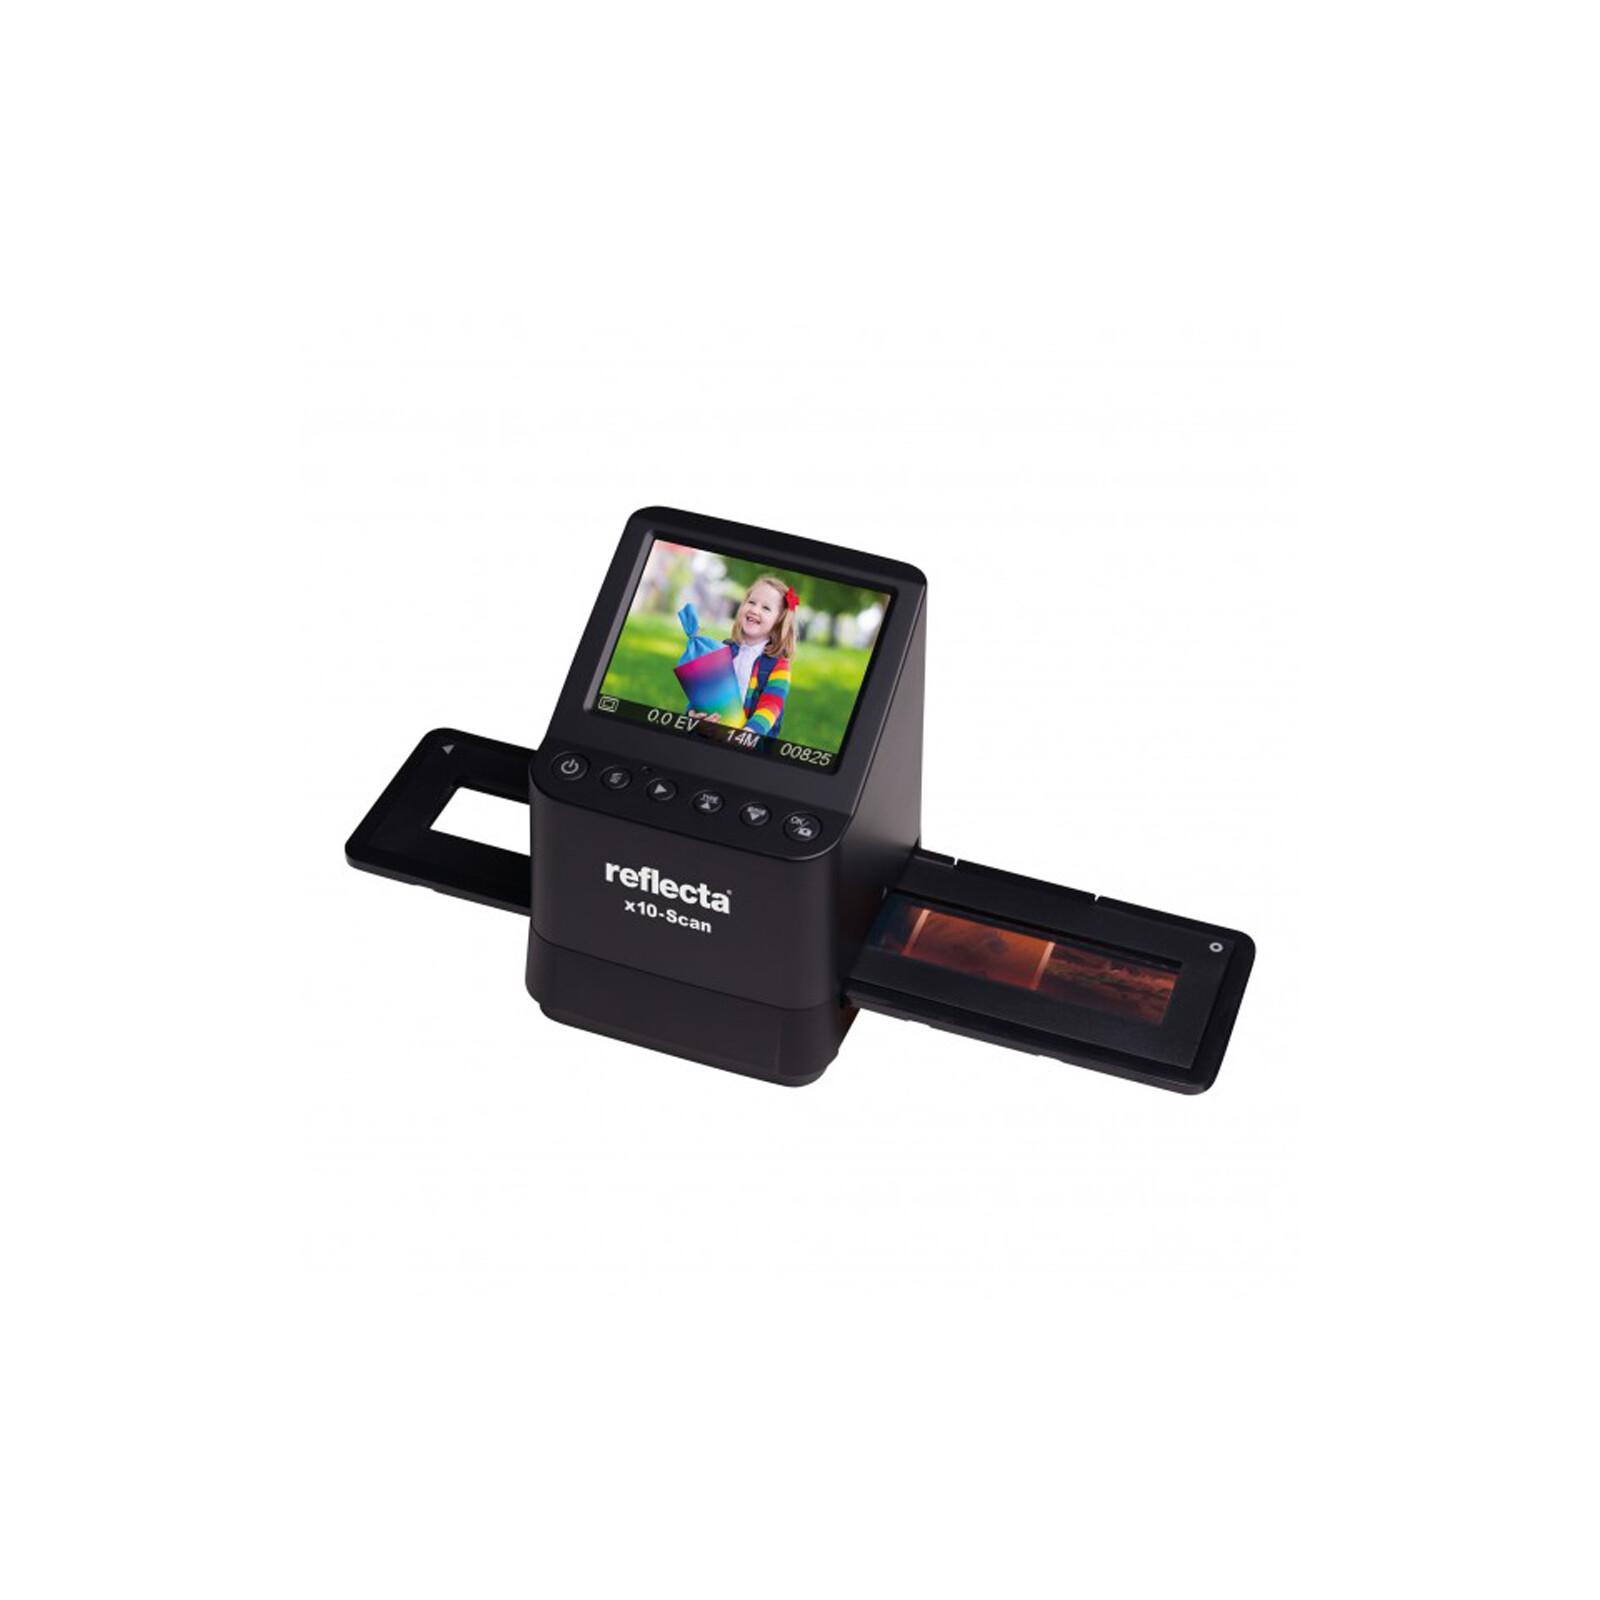 Reflecta X10 SCAN Filmscanner